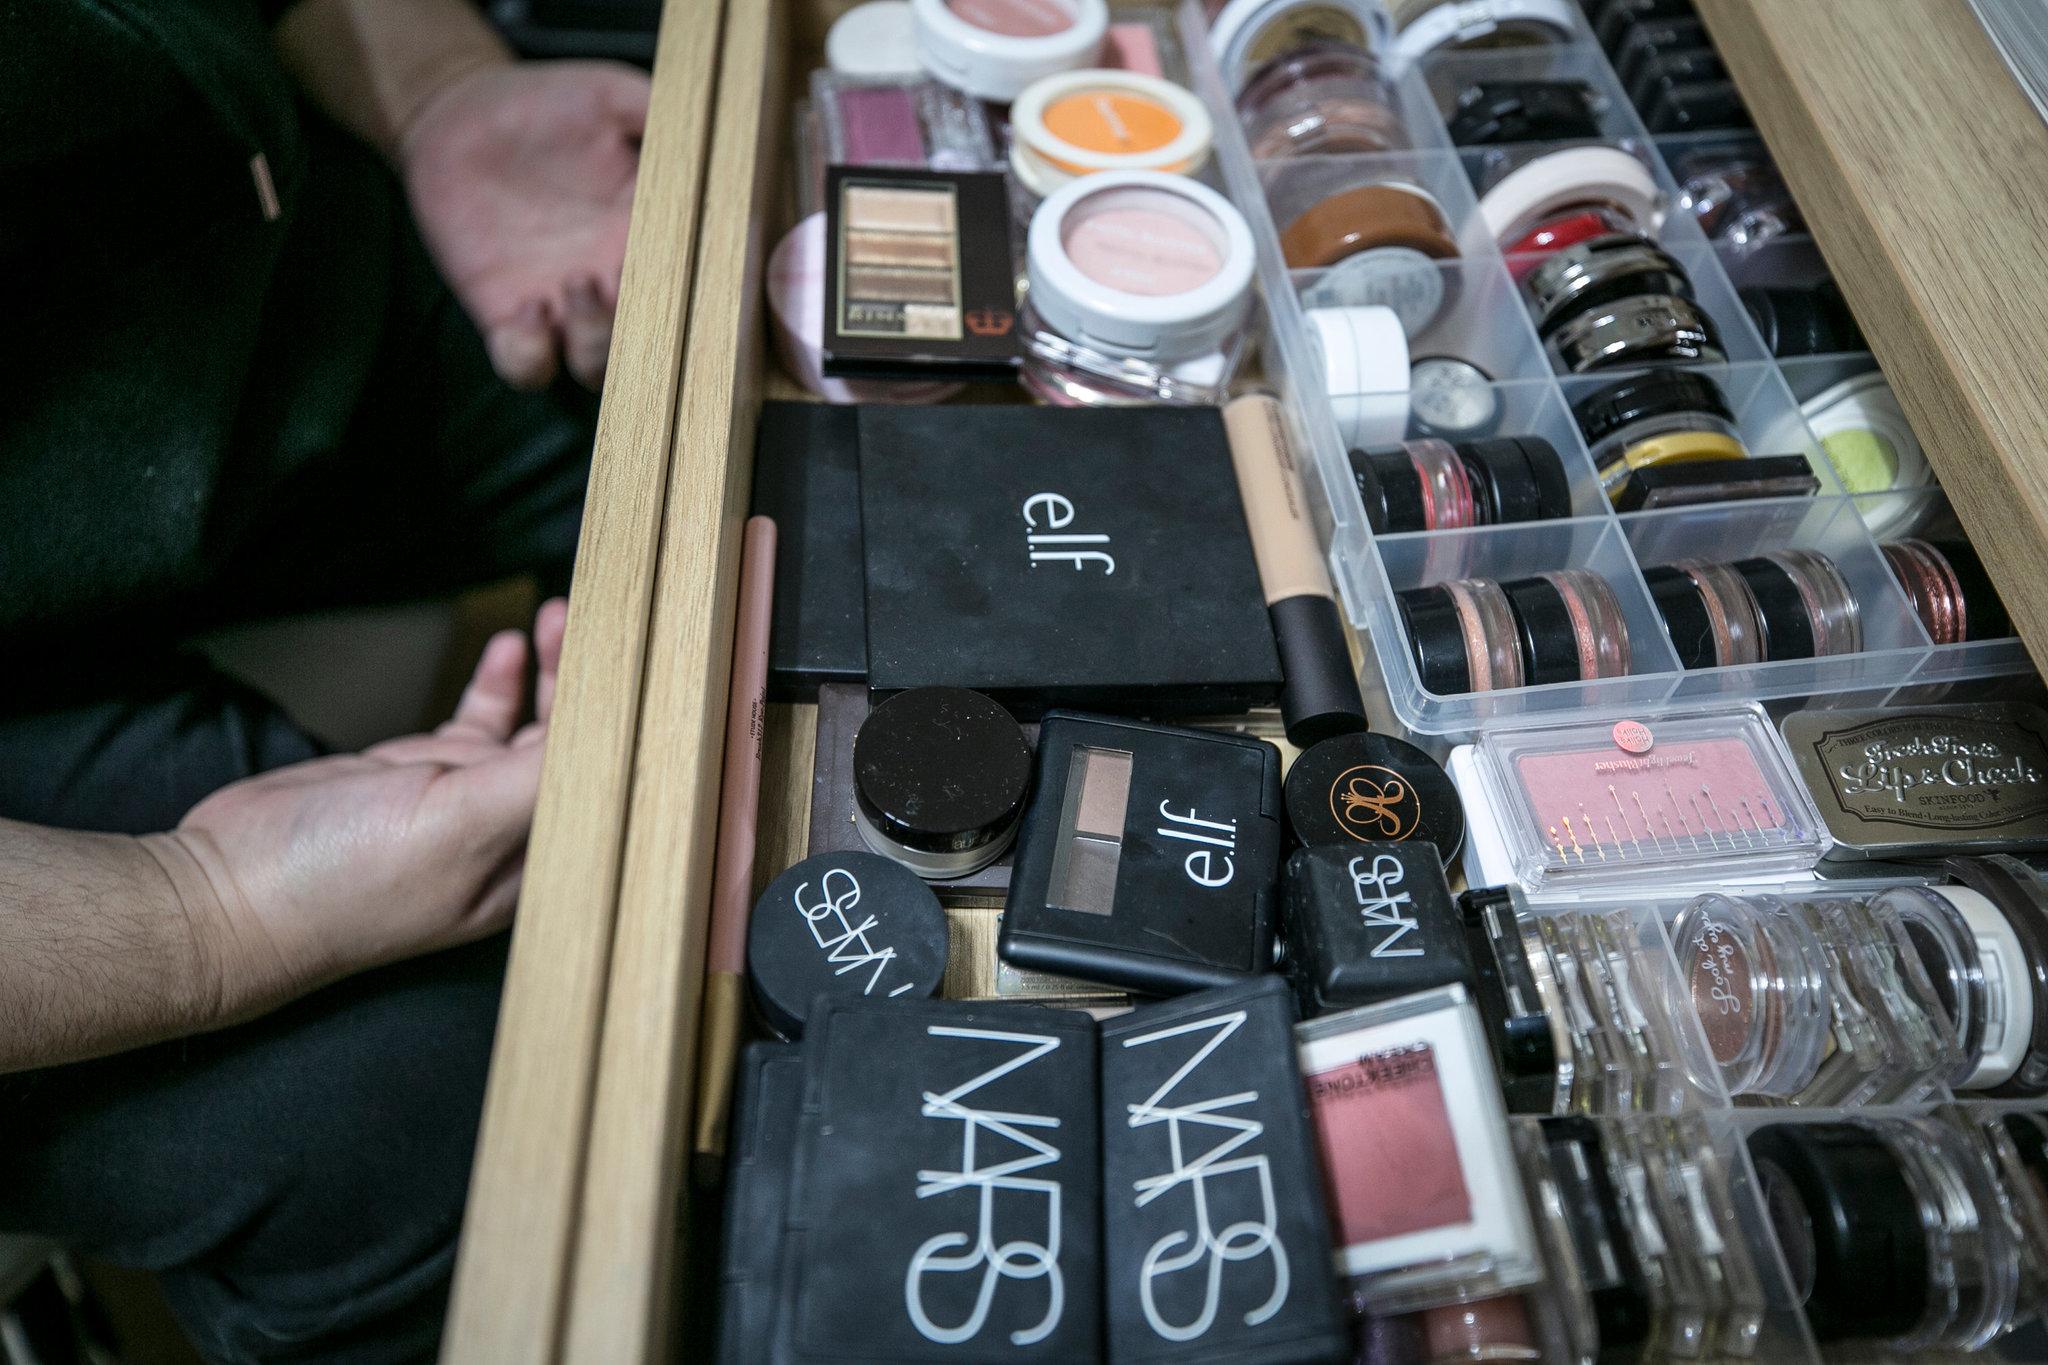 Lina Bae's drawer full of makeup kits.